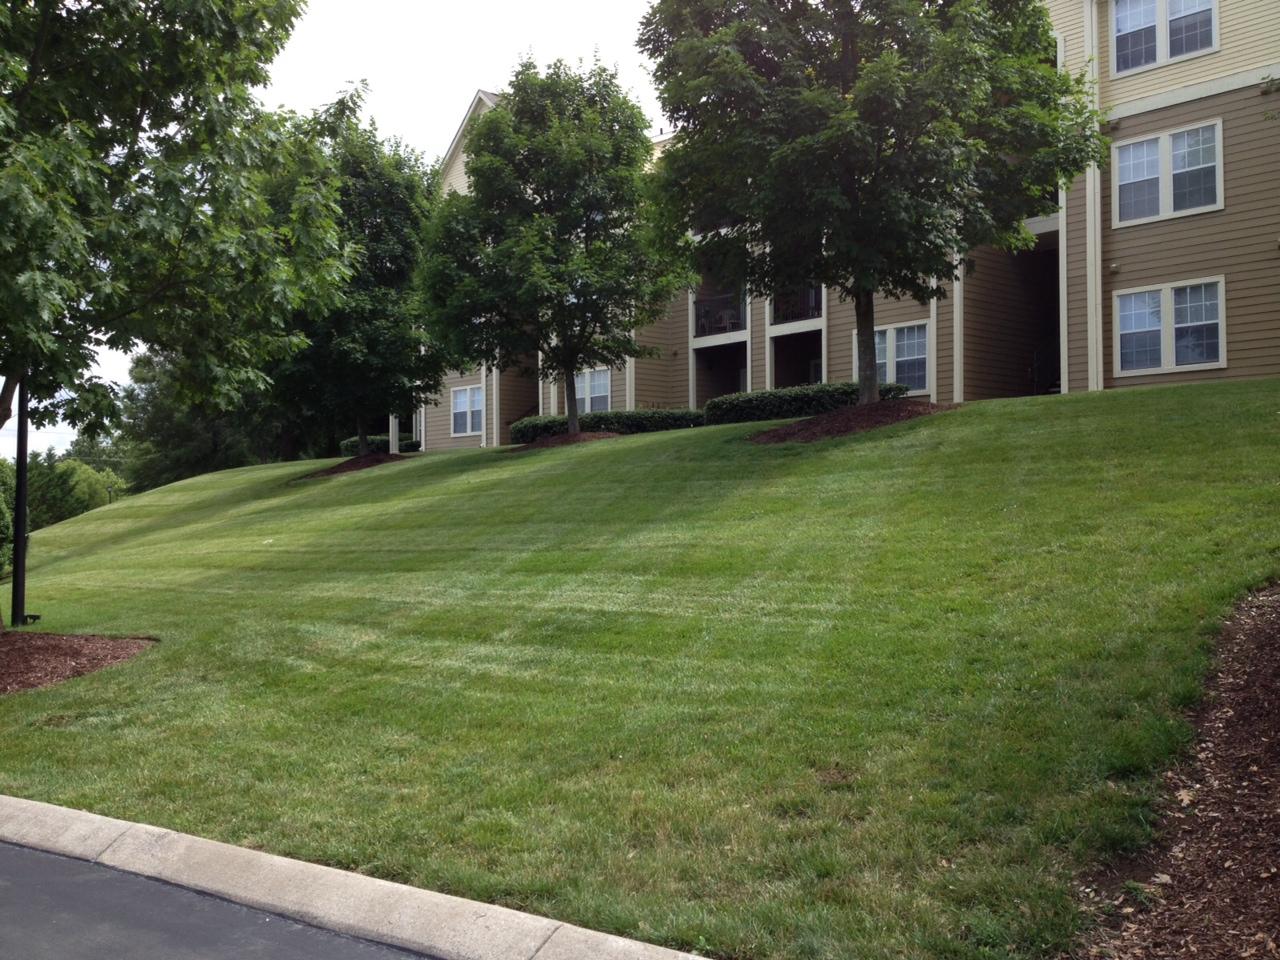 5 Summer Lawn Tips